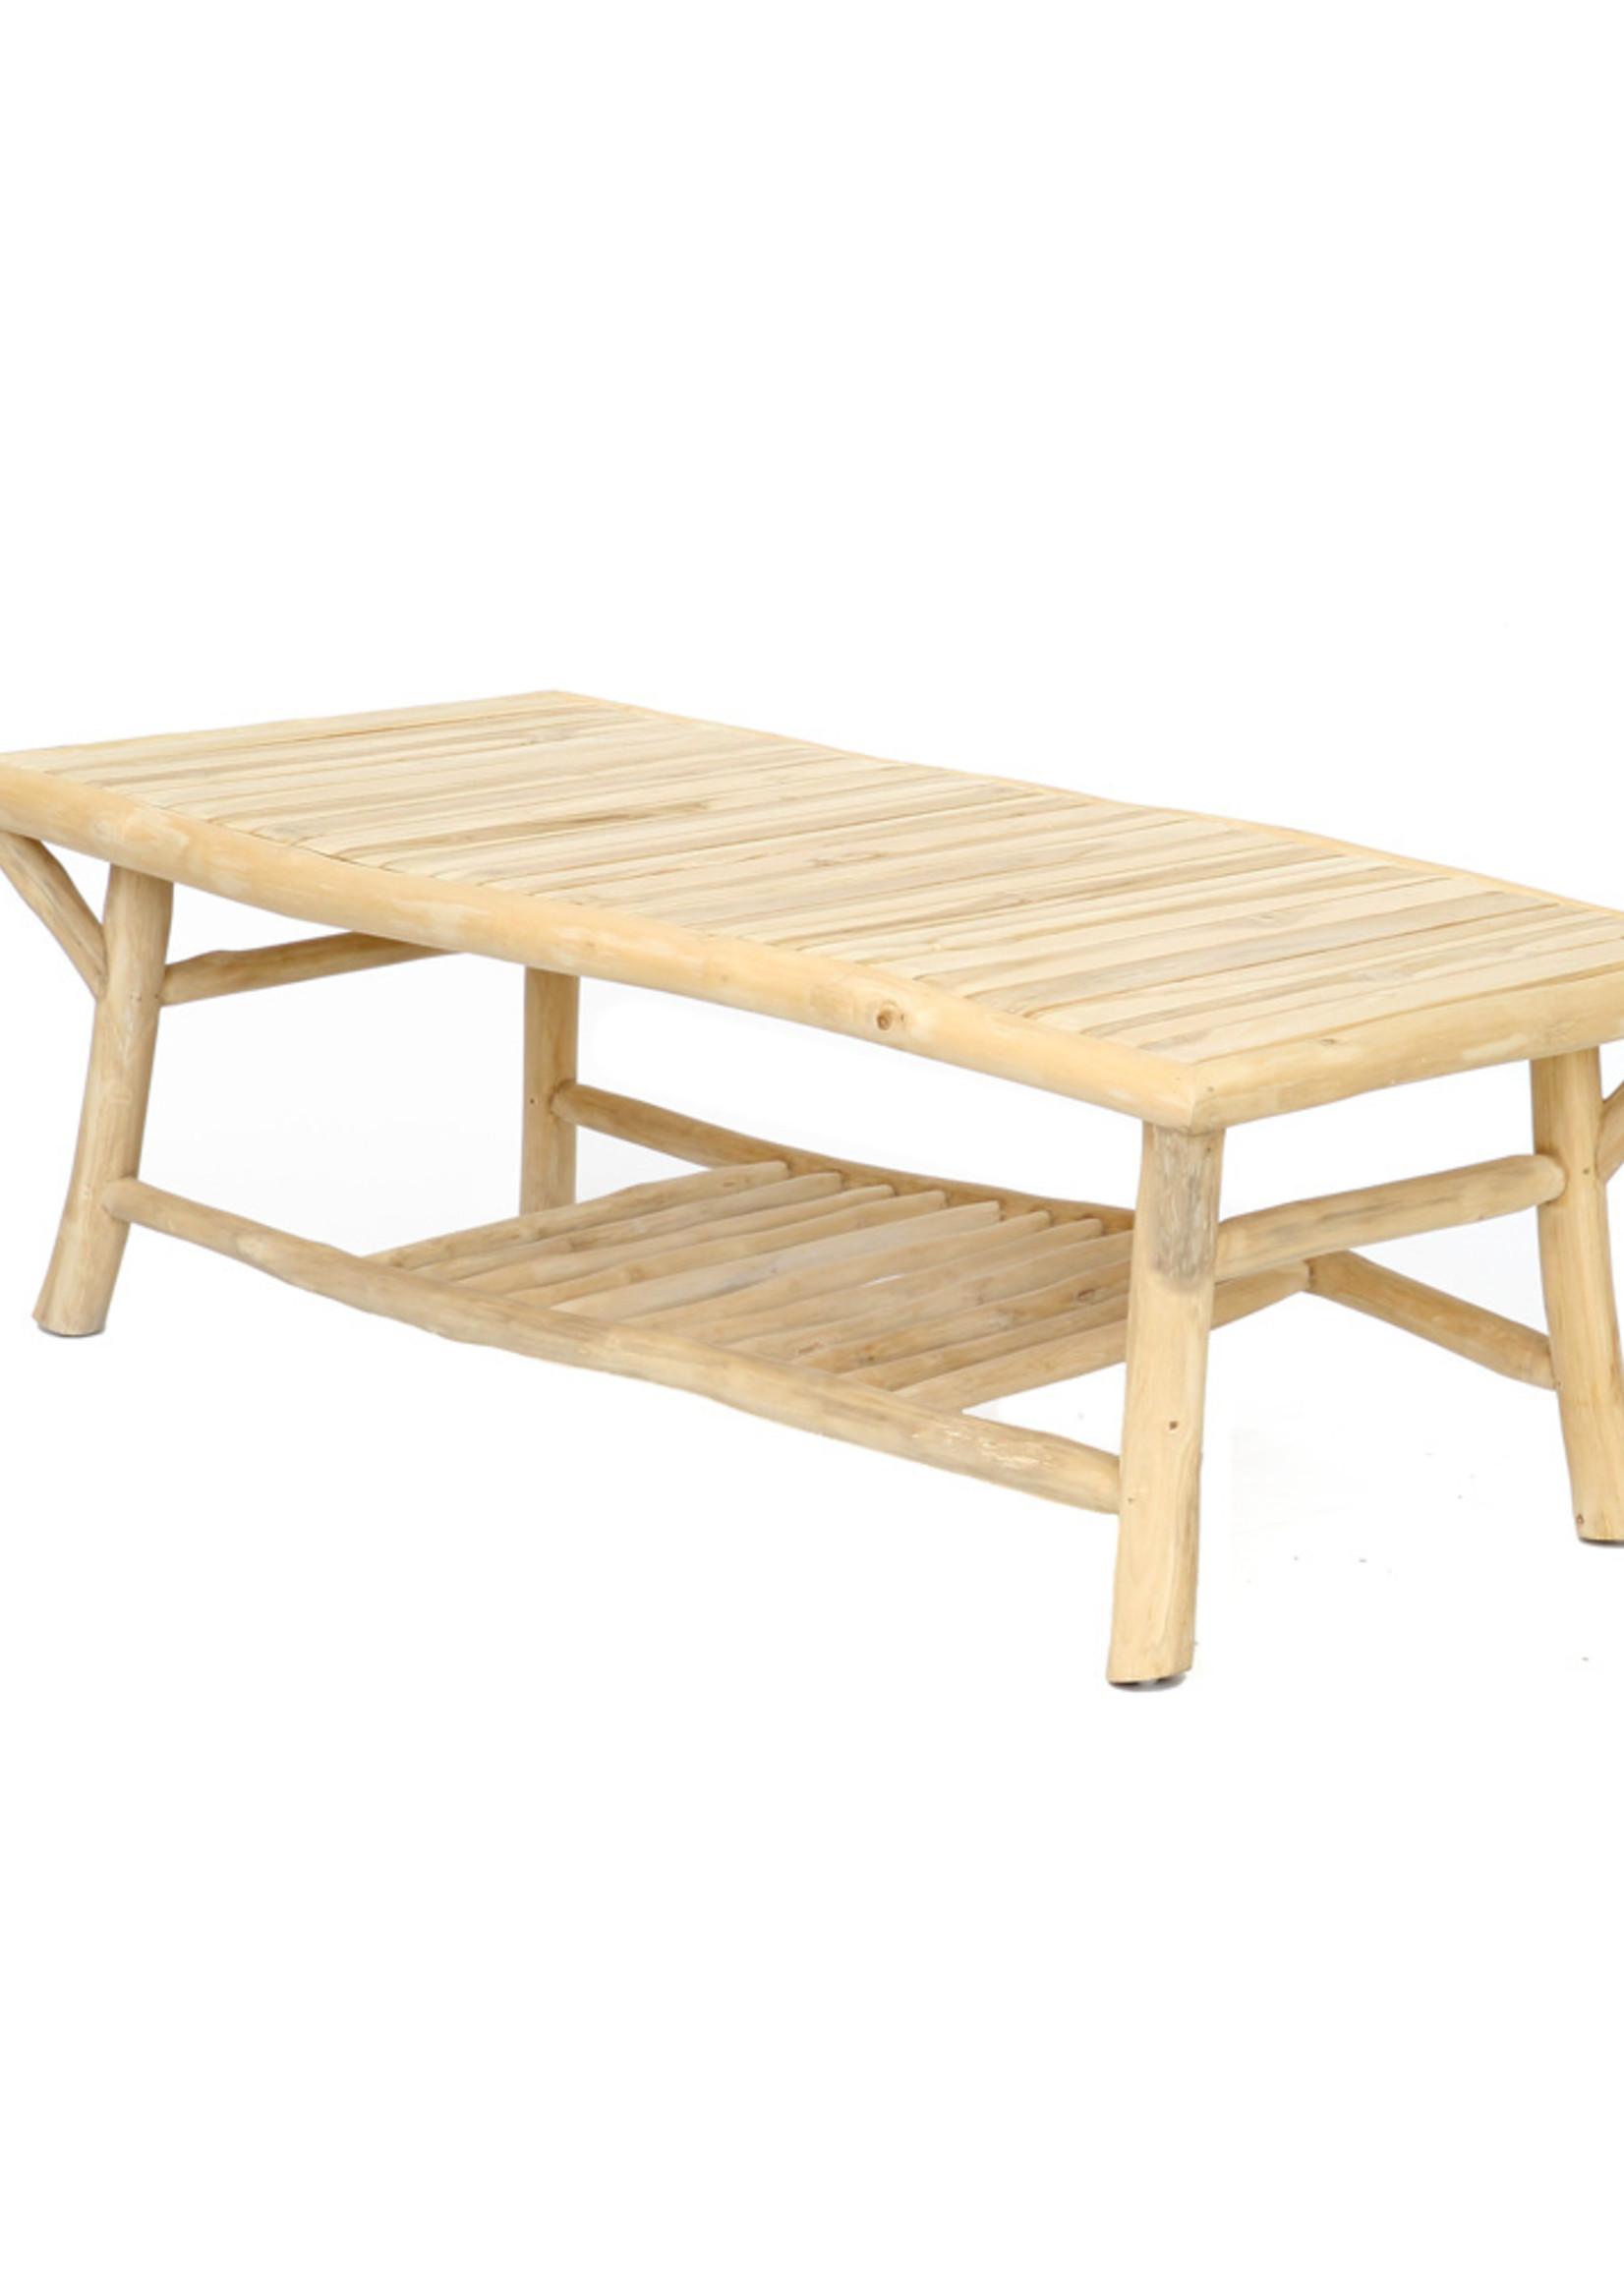 The Tulum Coffee Table